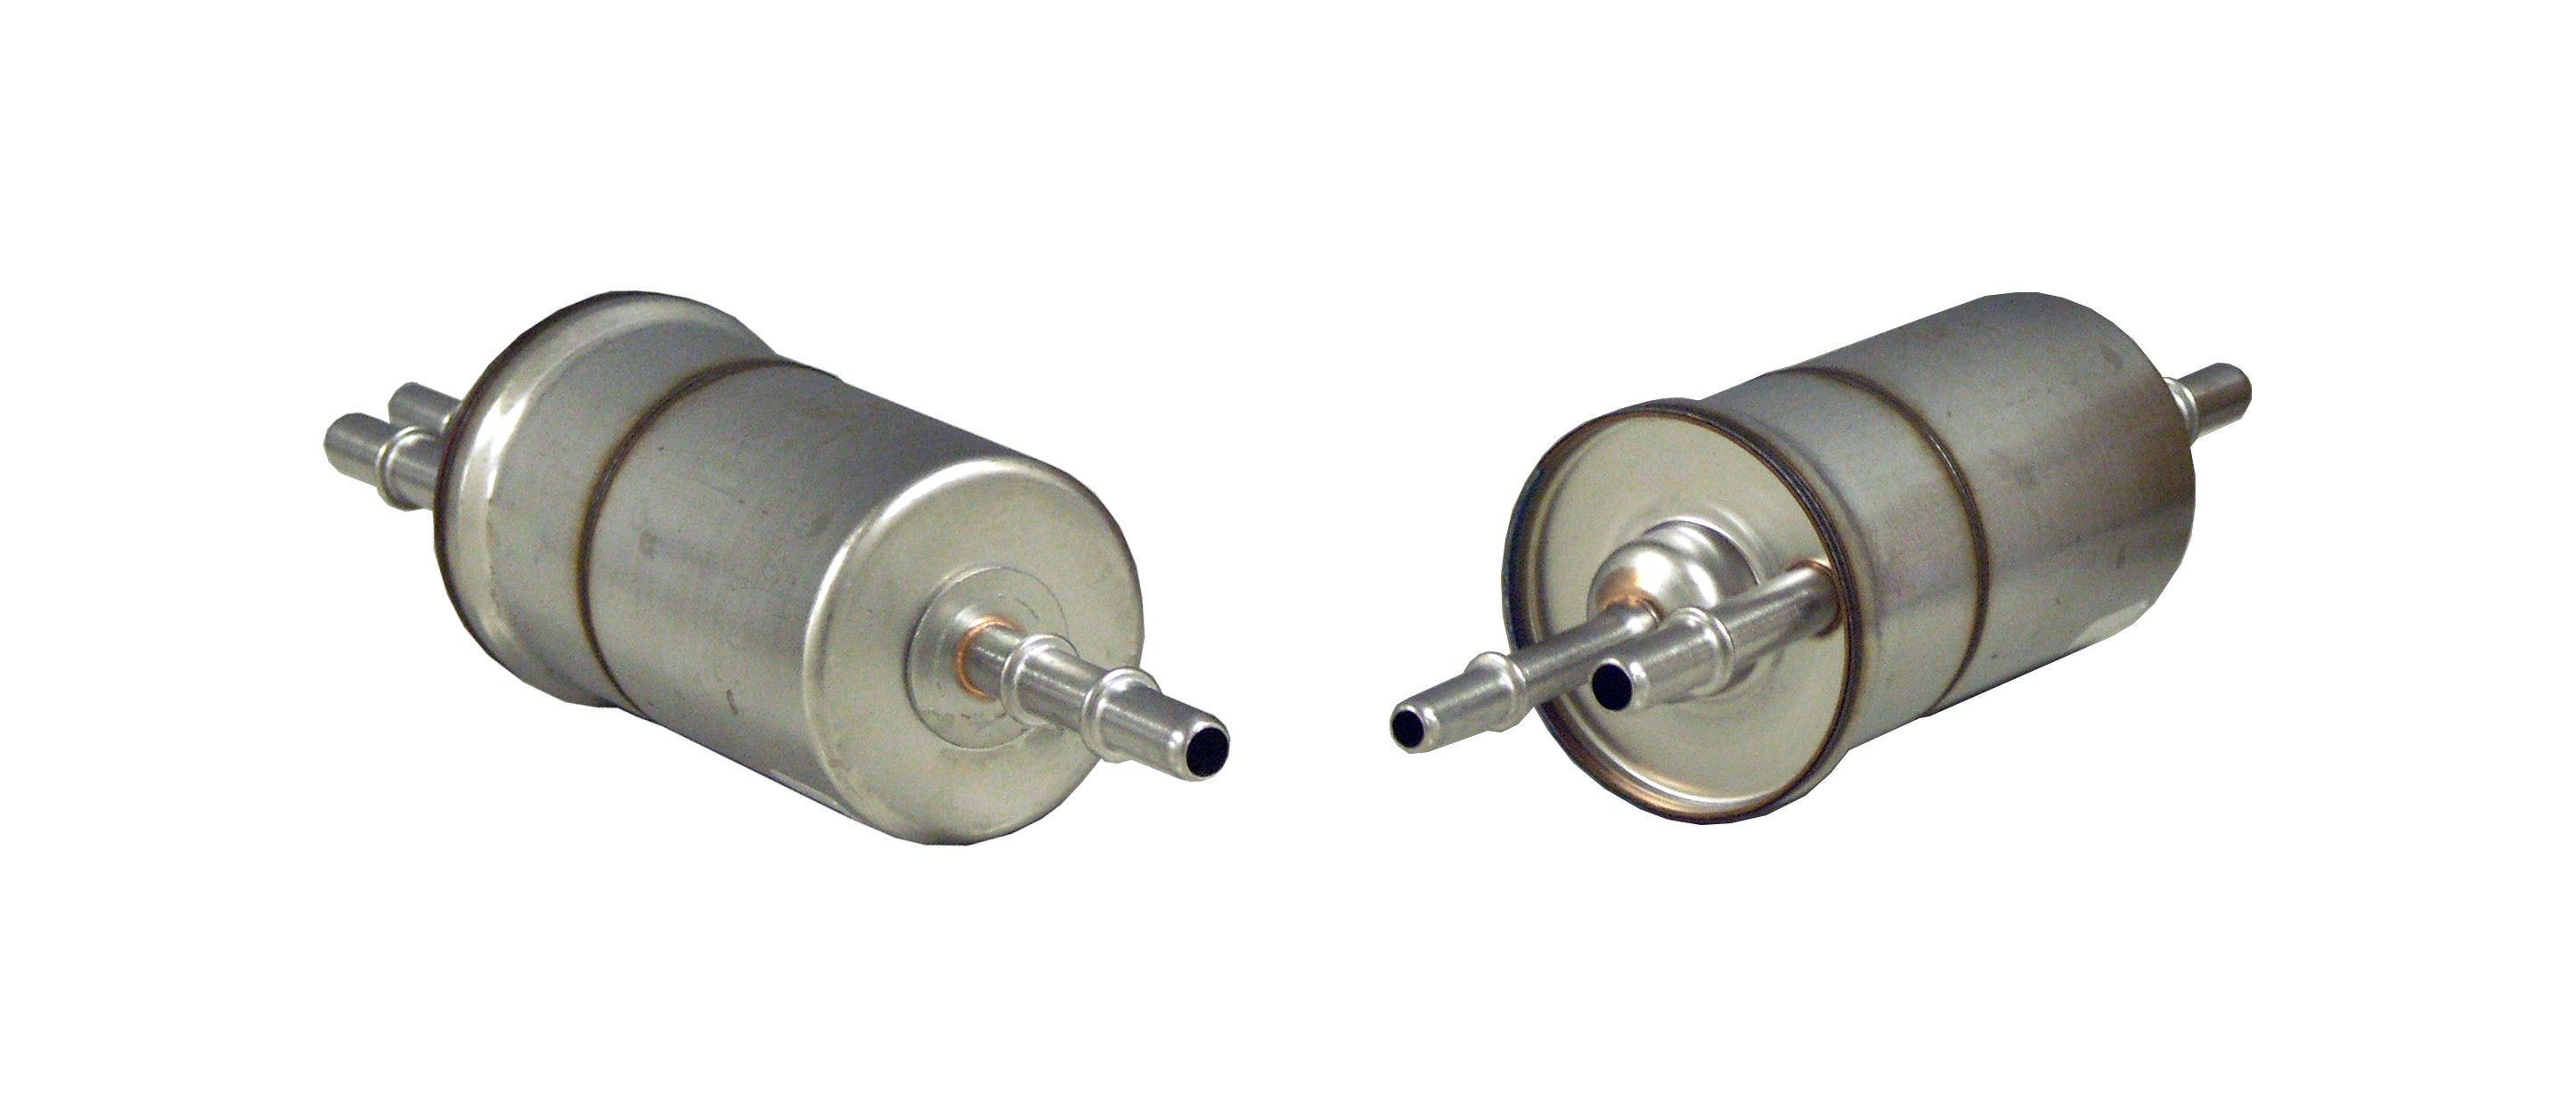 Saturn Sl1 Fuel Filter Replacement Fram Hastings Premium Guard Sl Location 1998 4 Cyl 19l Wix 33731